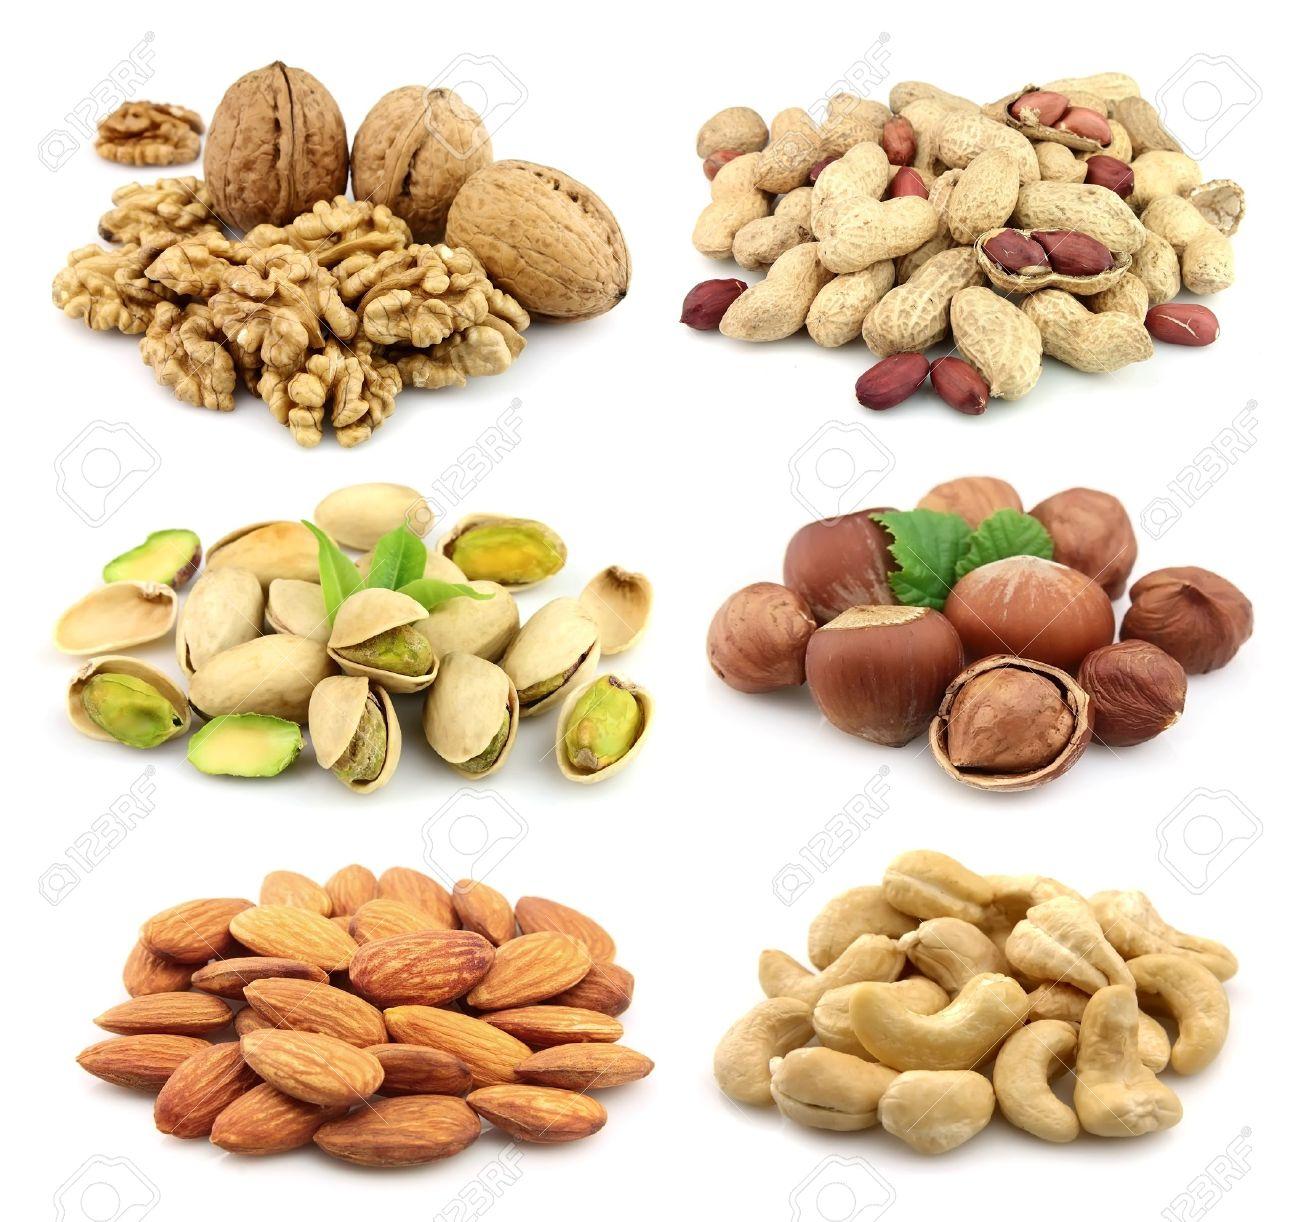 Collage of nuts: walnuts,filbert,peanut,almonds,pistachios,cashew Stock Photo - 12066814